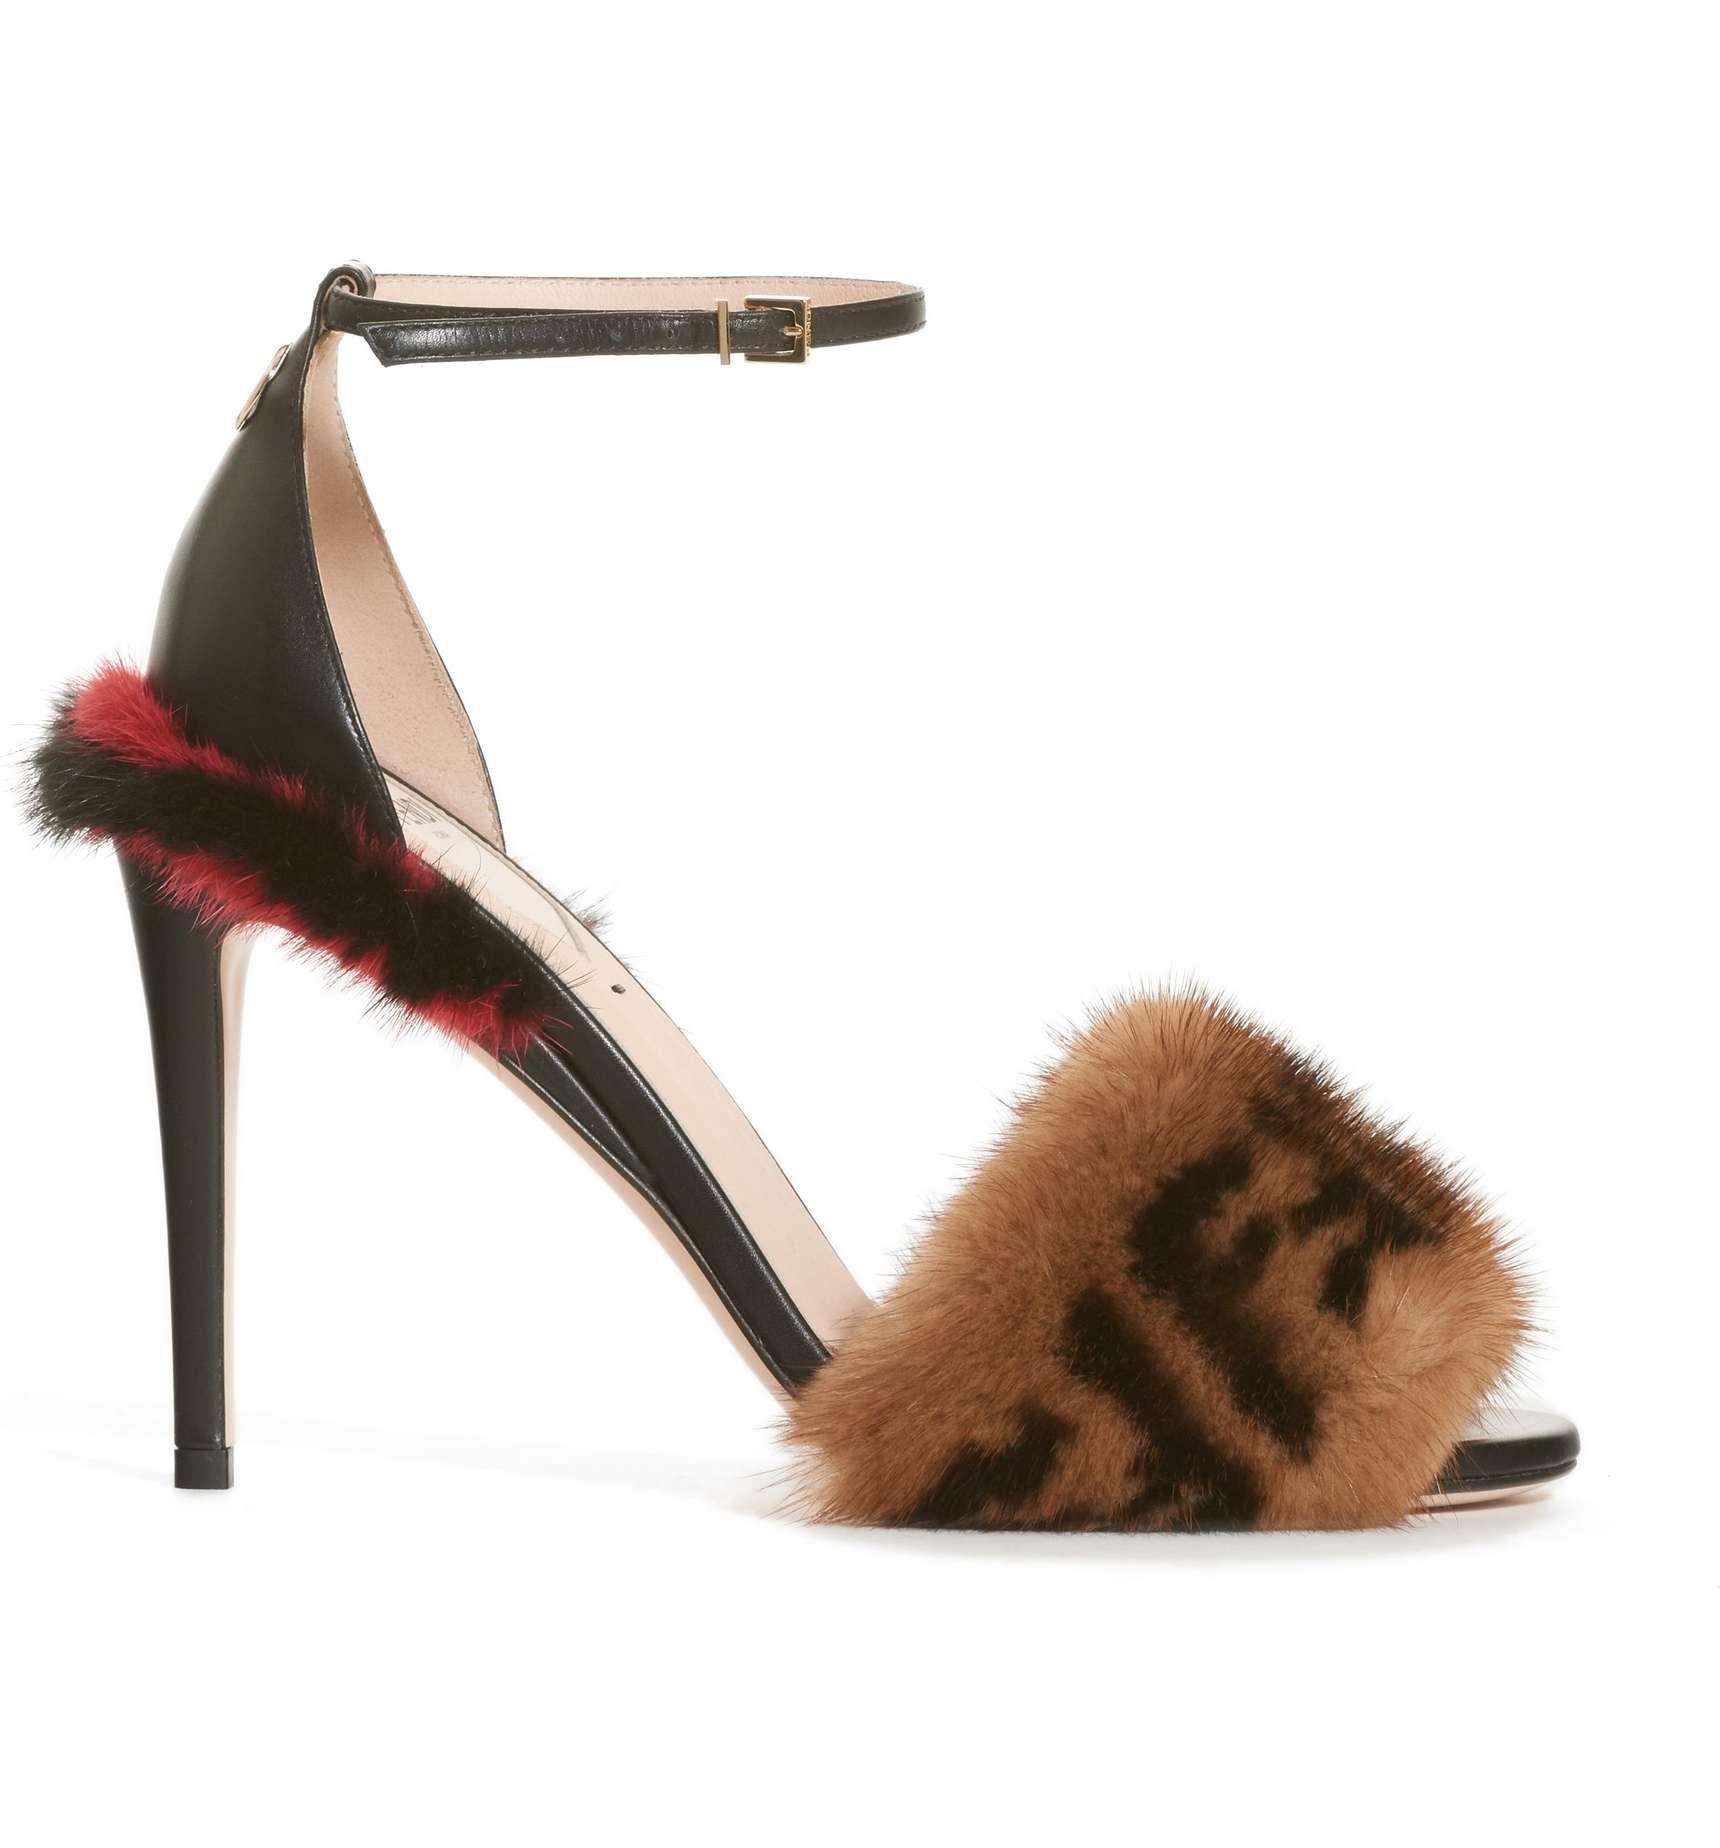 Fendi, Fur heels